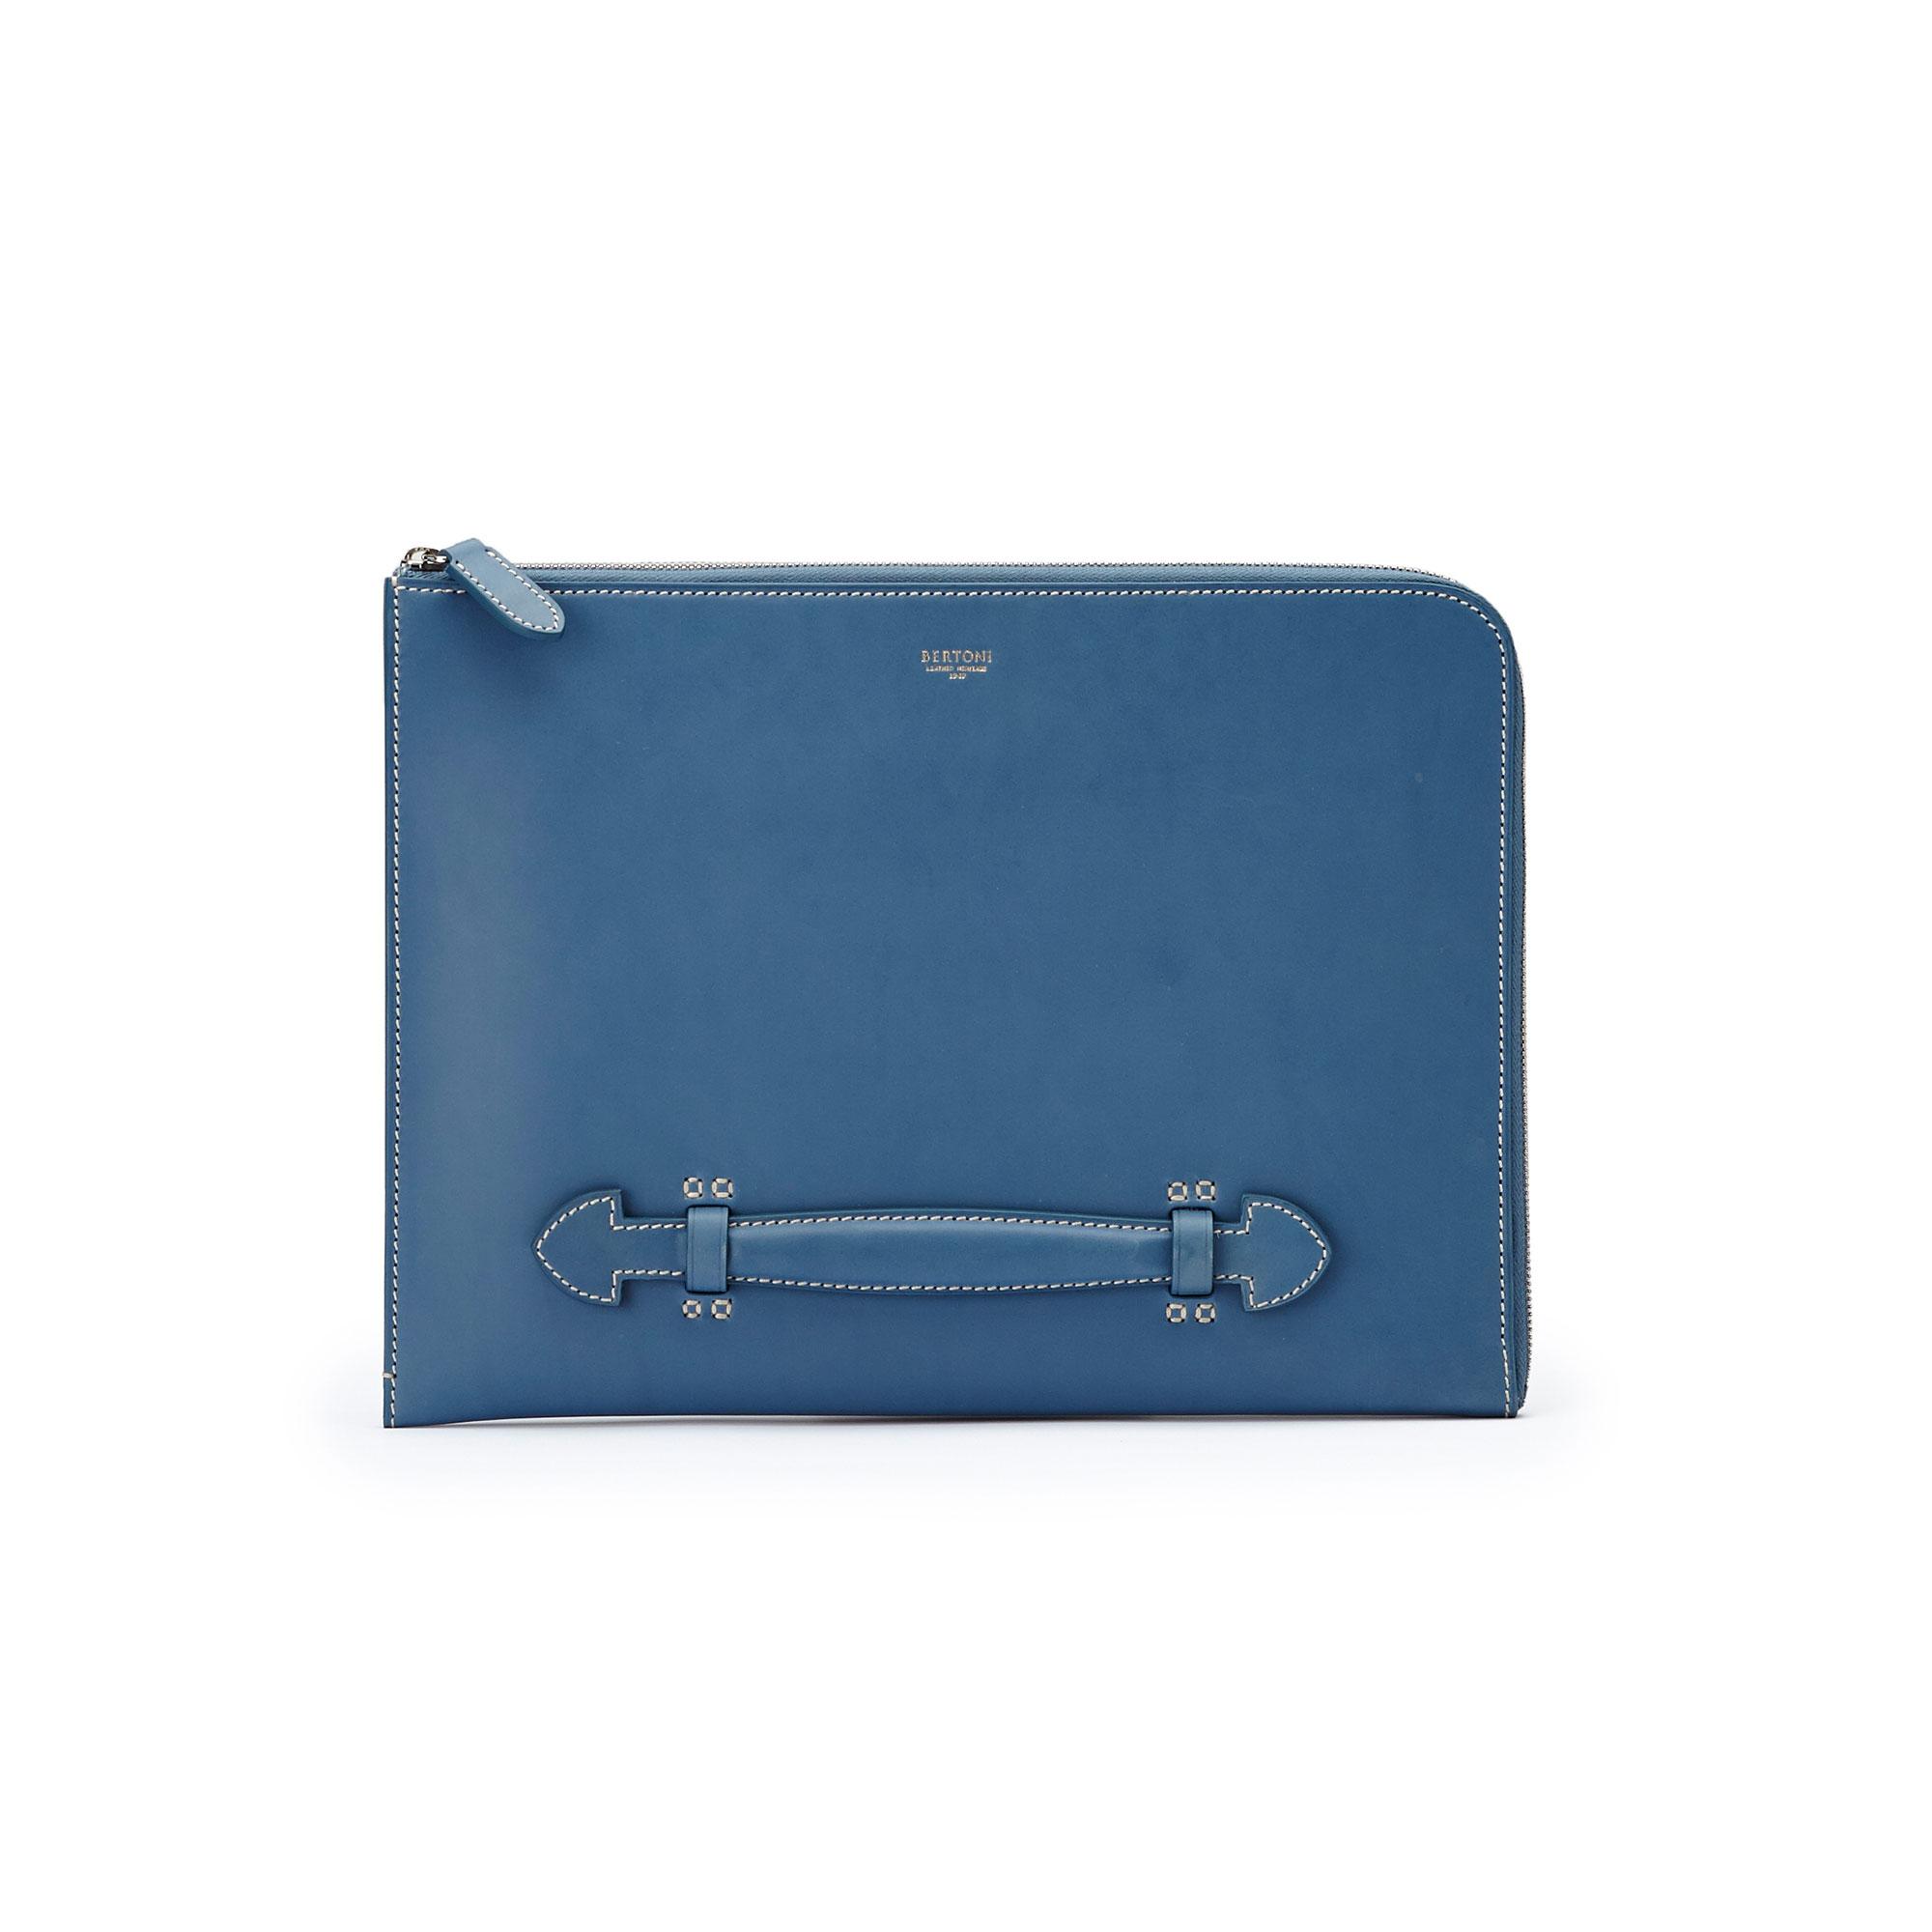 The blue french calf Handle Zip Folio 33 by Bertoni 1949 01